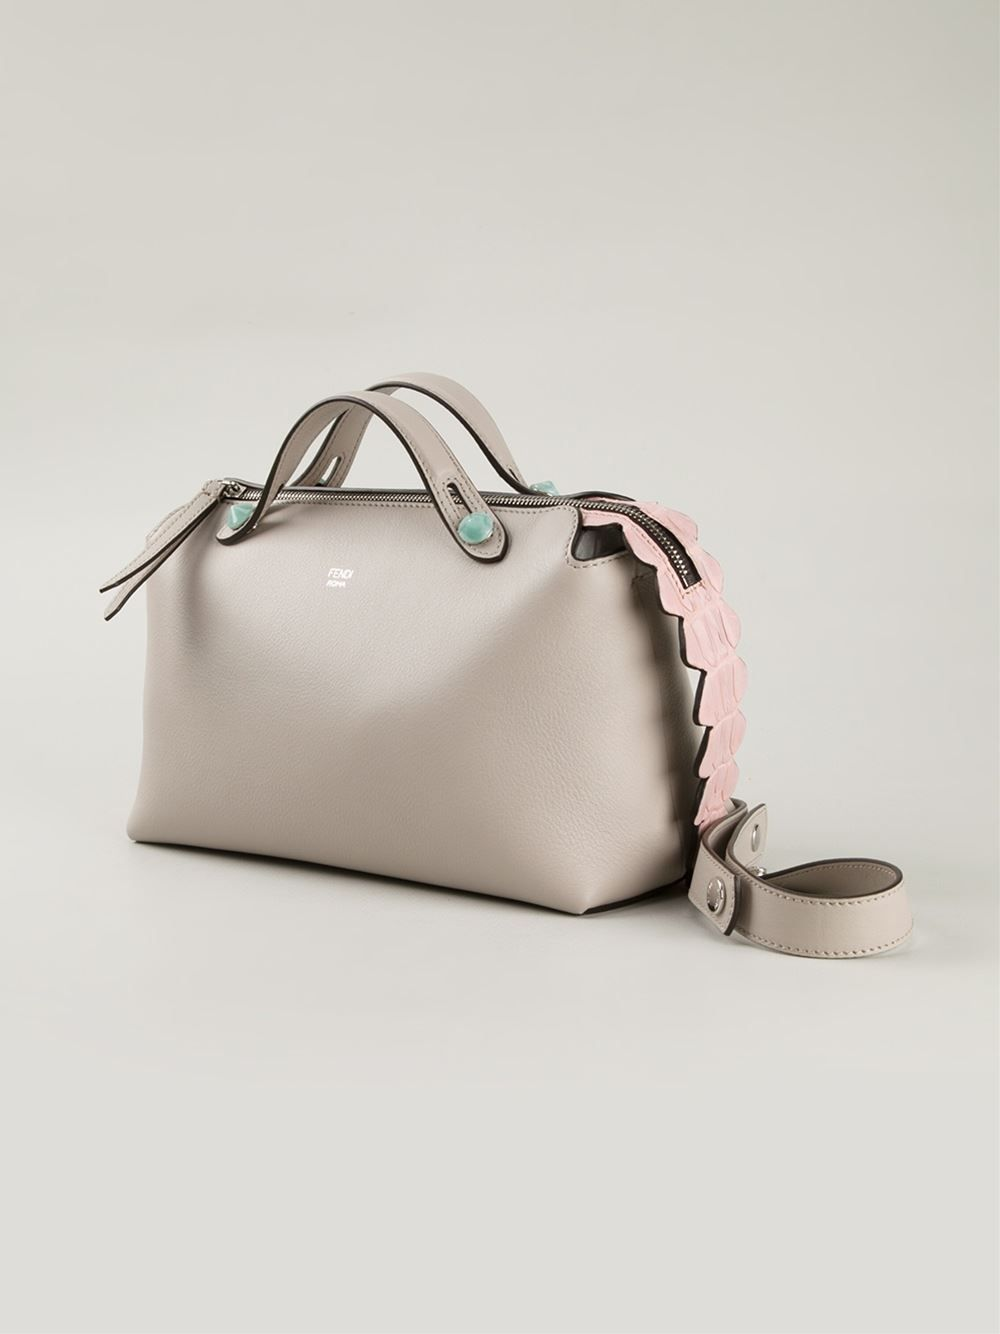 Fendi  by The Way  Shoulder Bag - - Farfetch.com  85c3eefe1814c